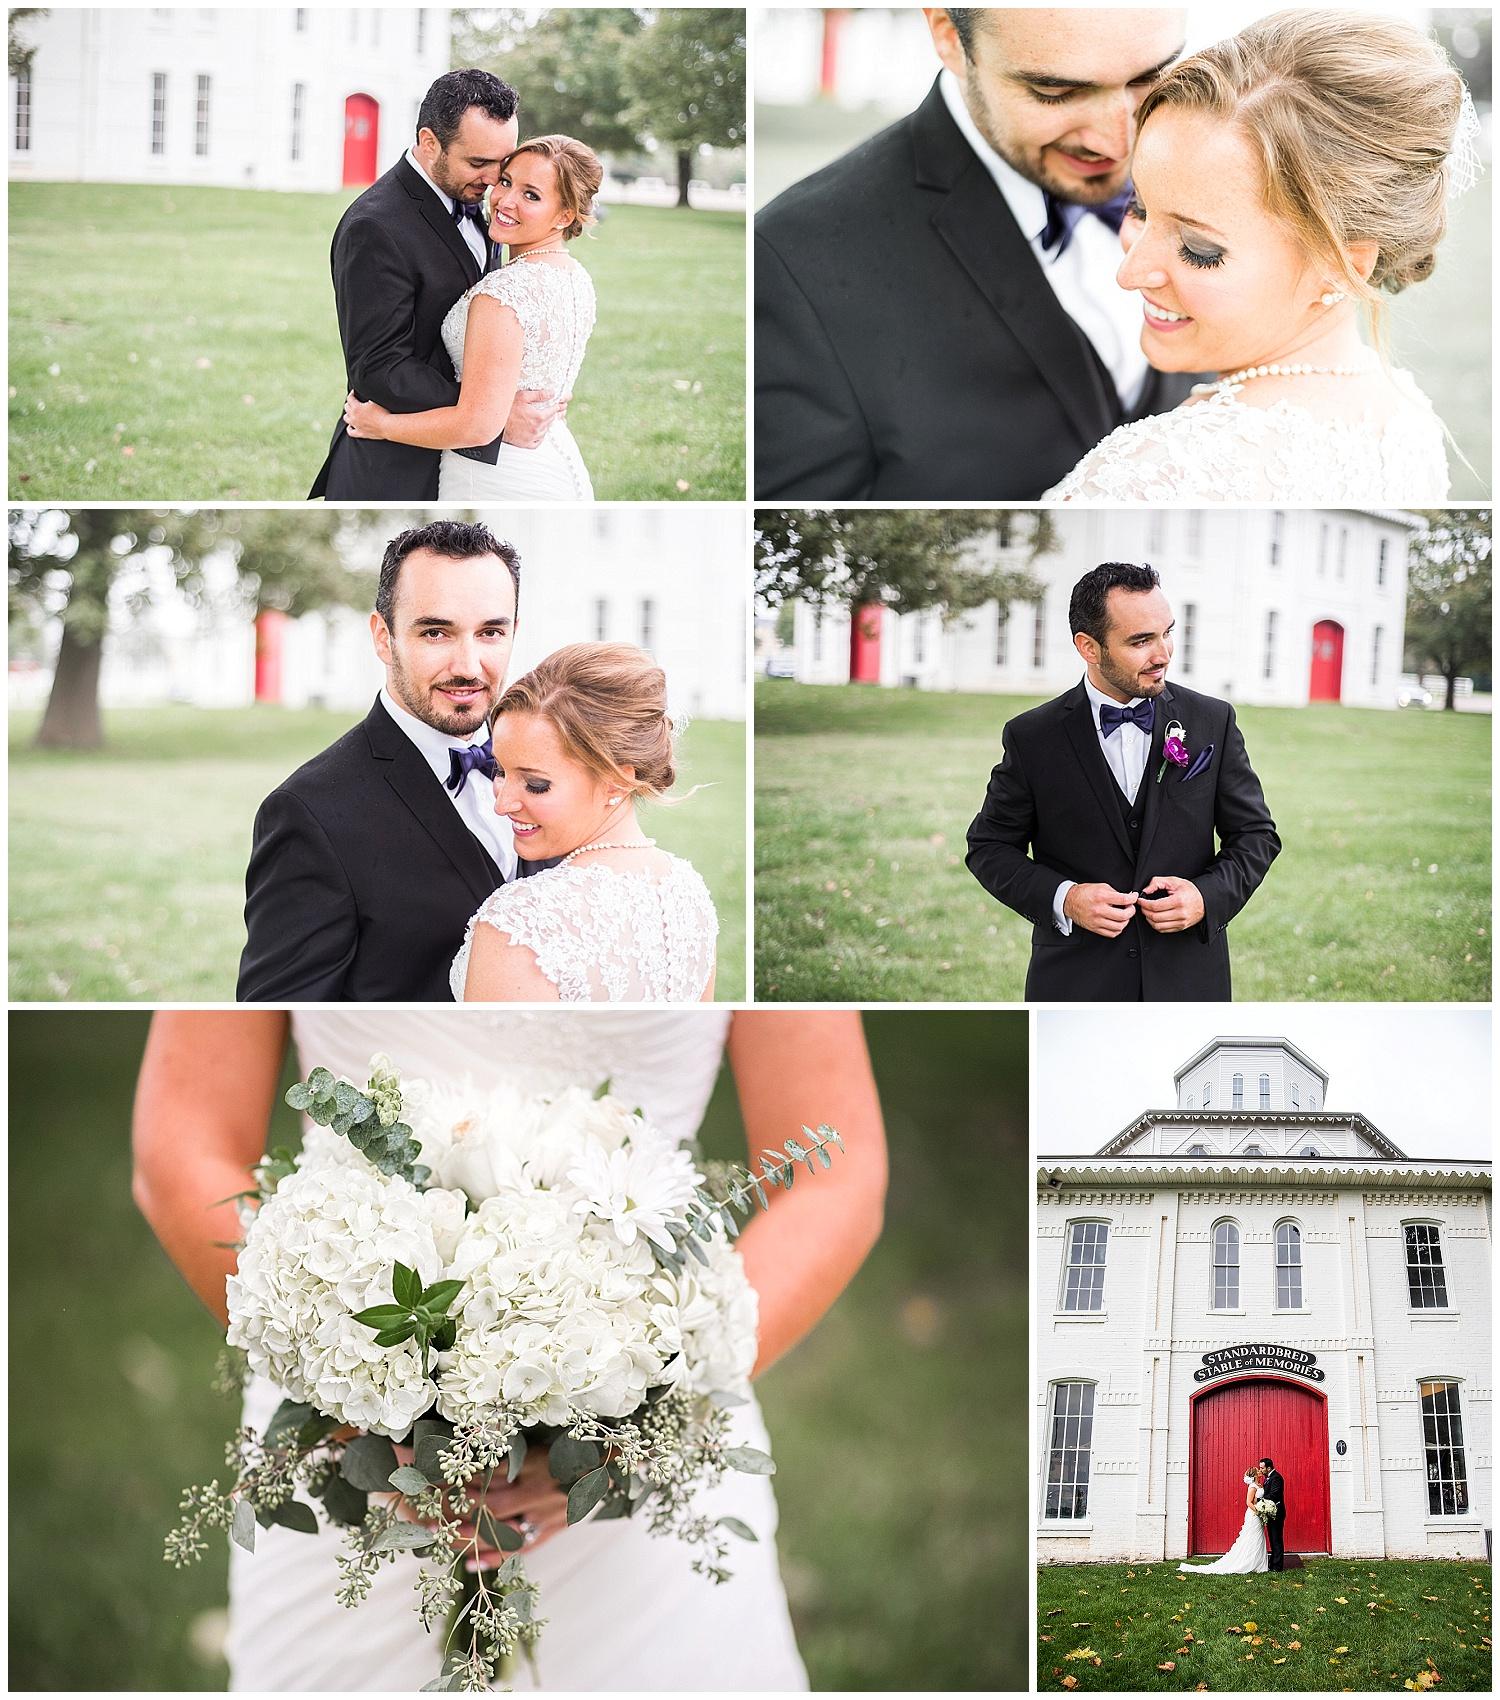 sara_sebastian_lexington_red_mile_wedding-9343.jpg